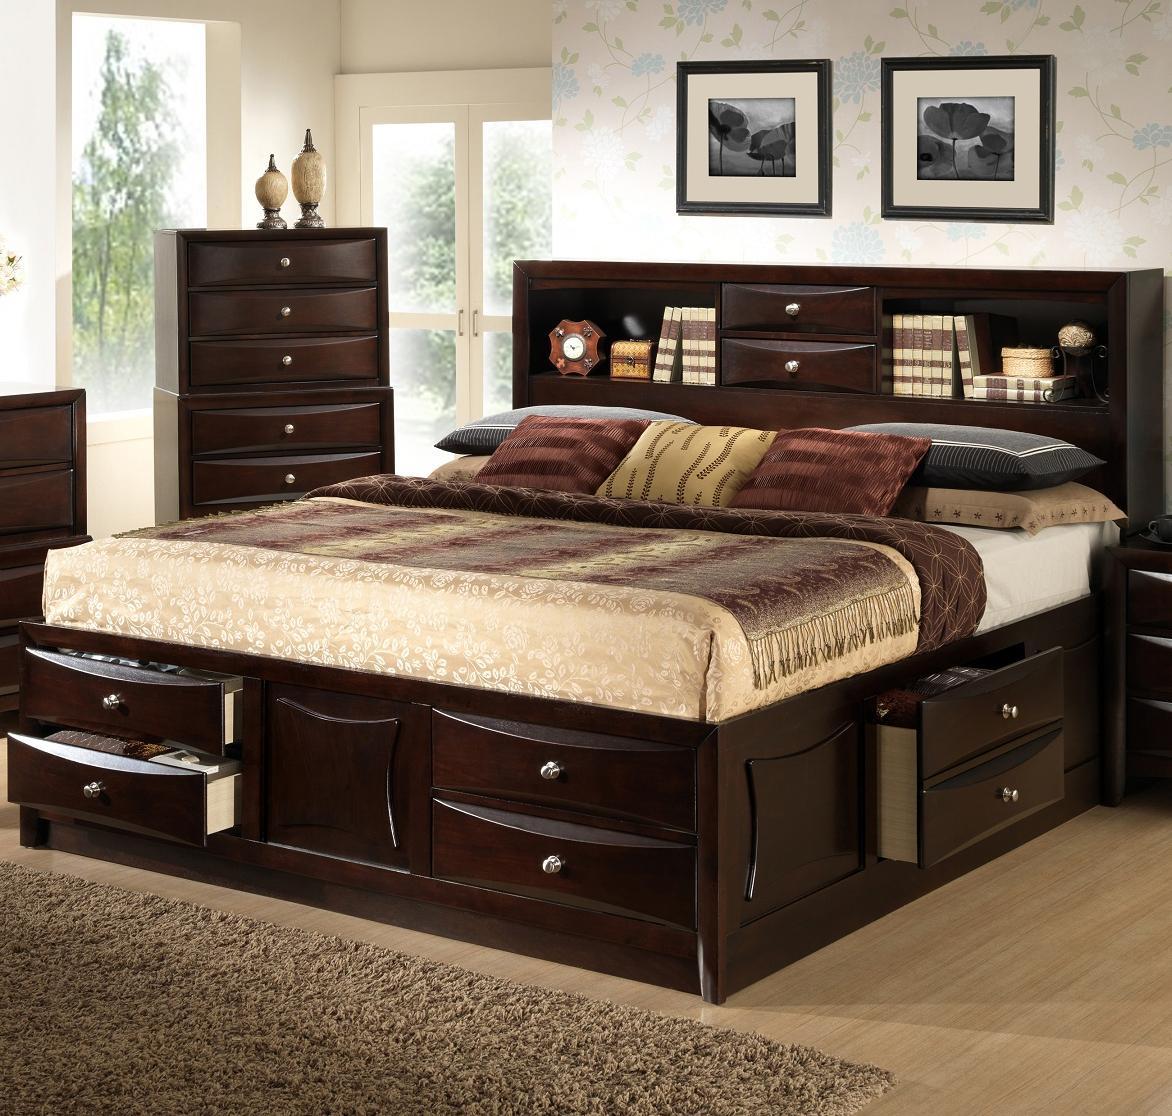 Lifestyle Todd King California King Storage Bed W